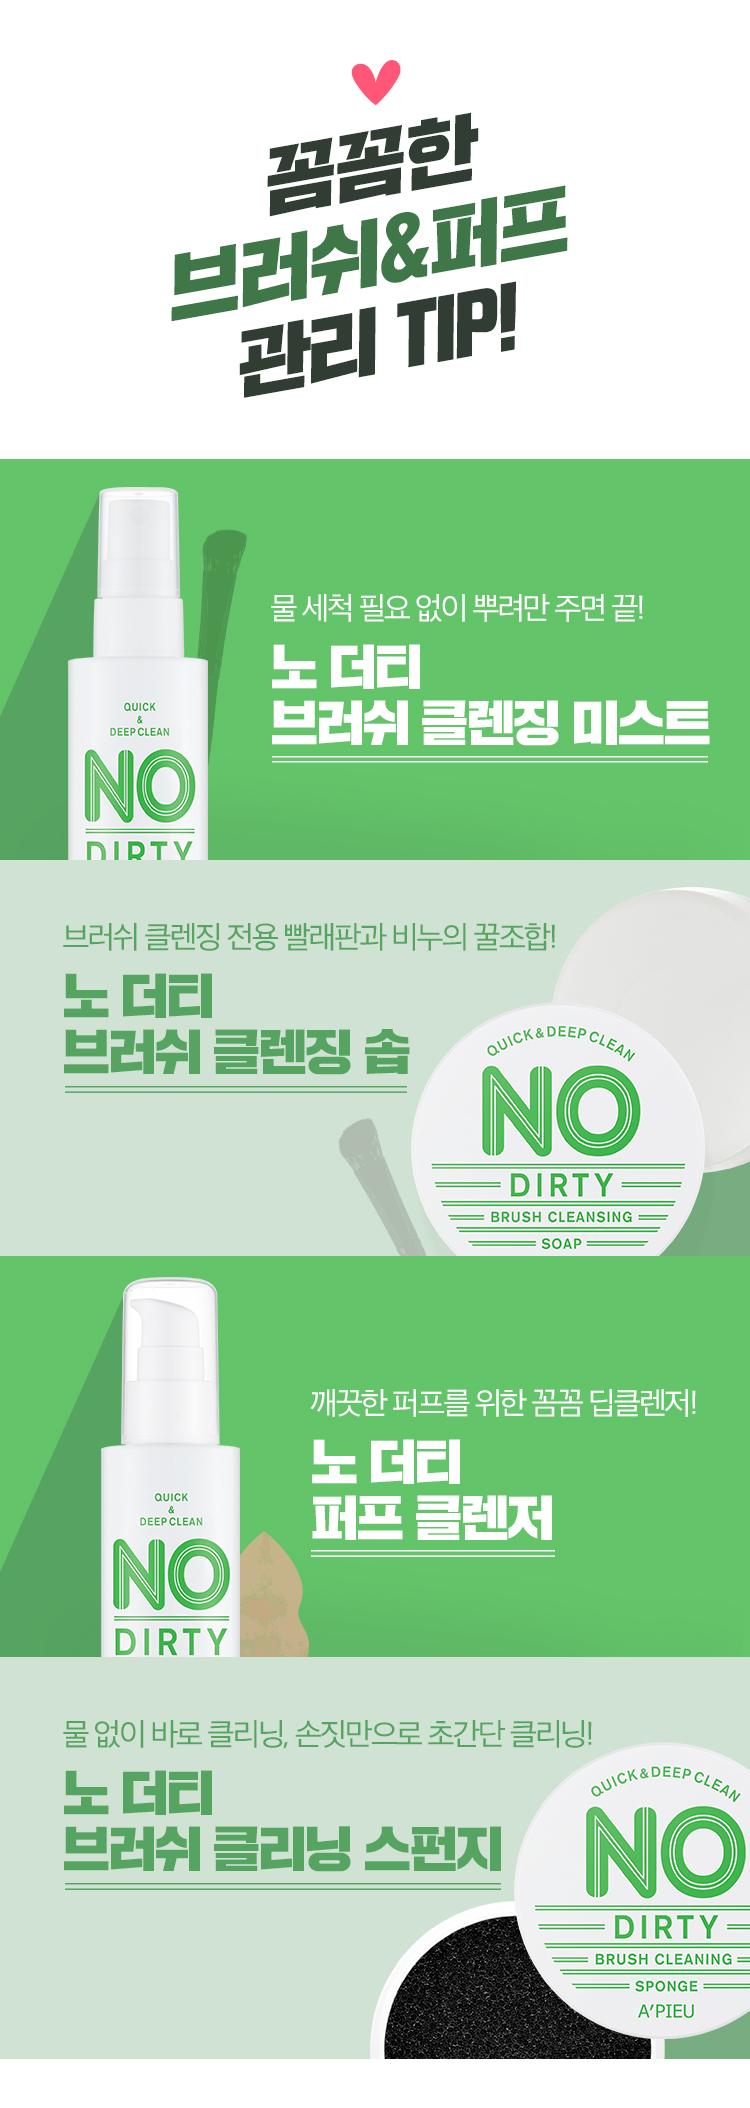 APIEU_No_Dirty_Brush_Cleansing_Sponge_05.jpg